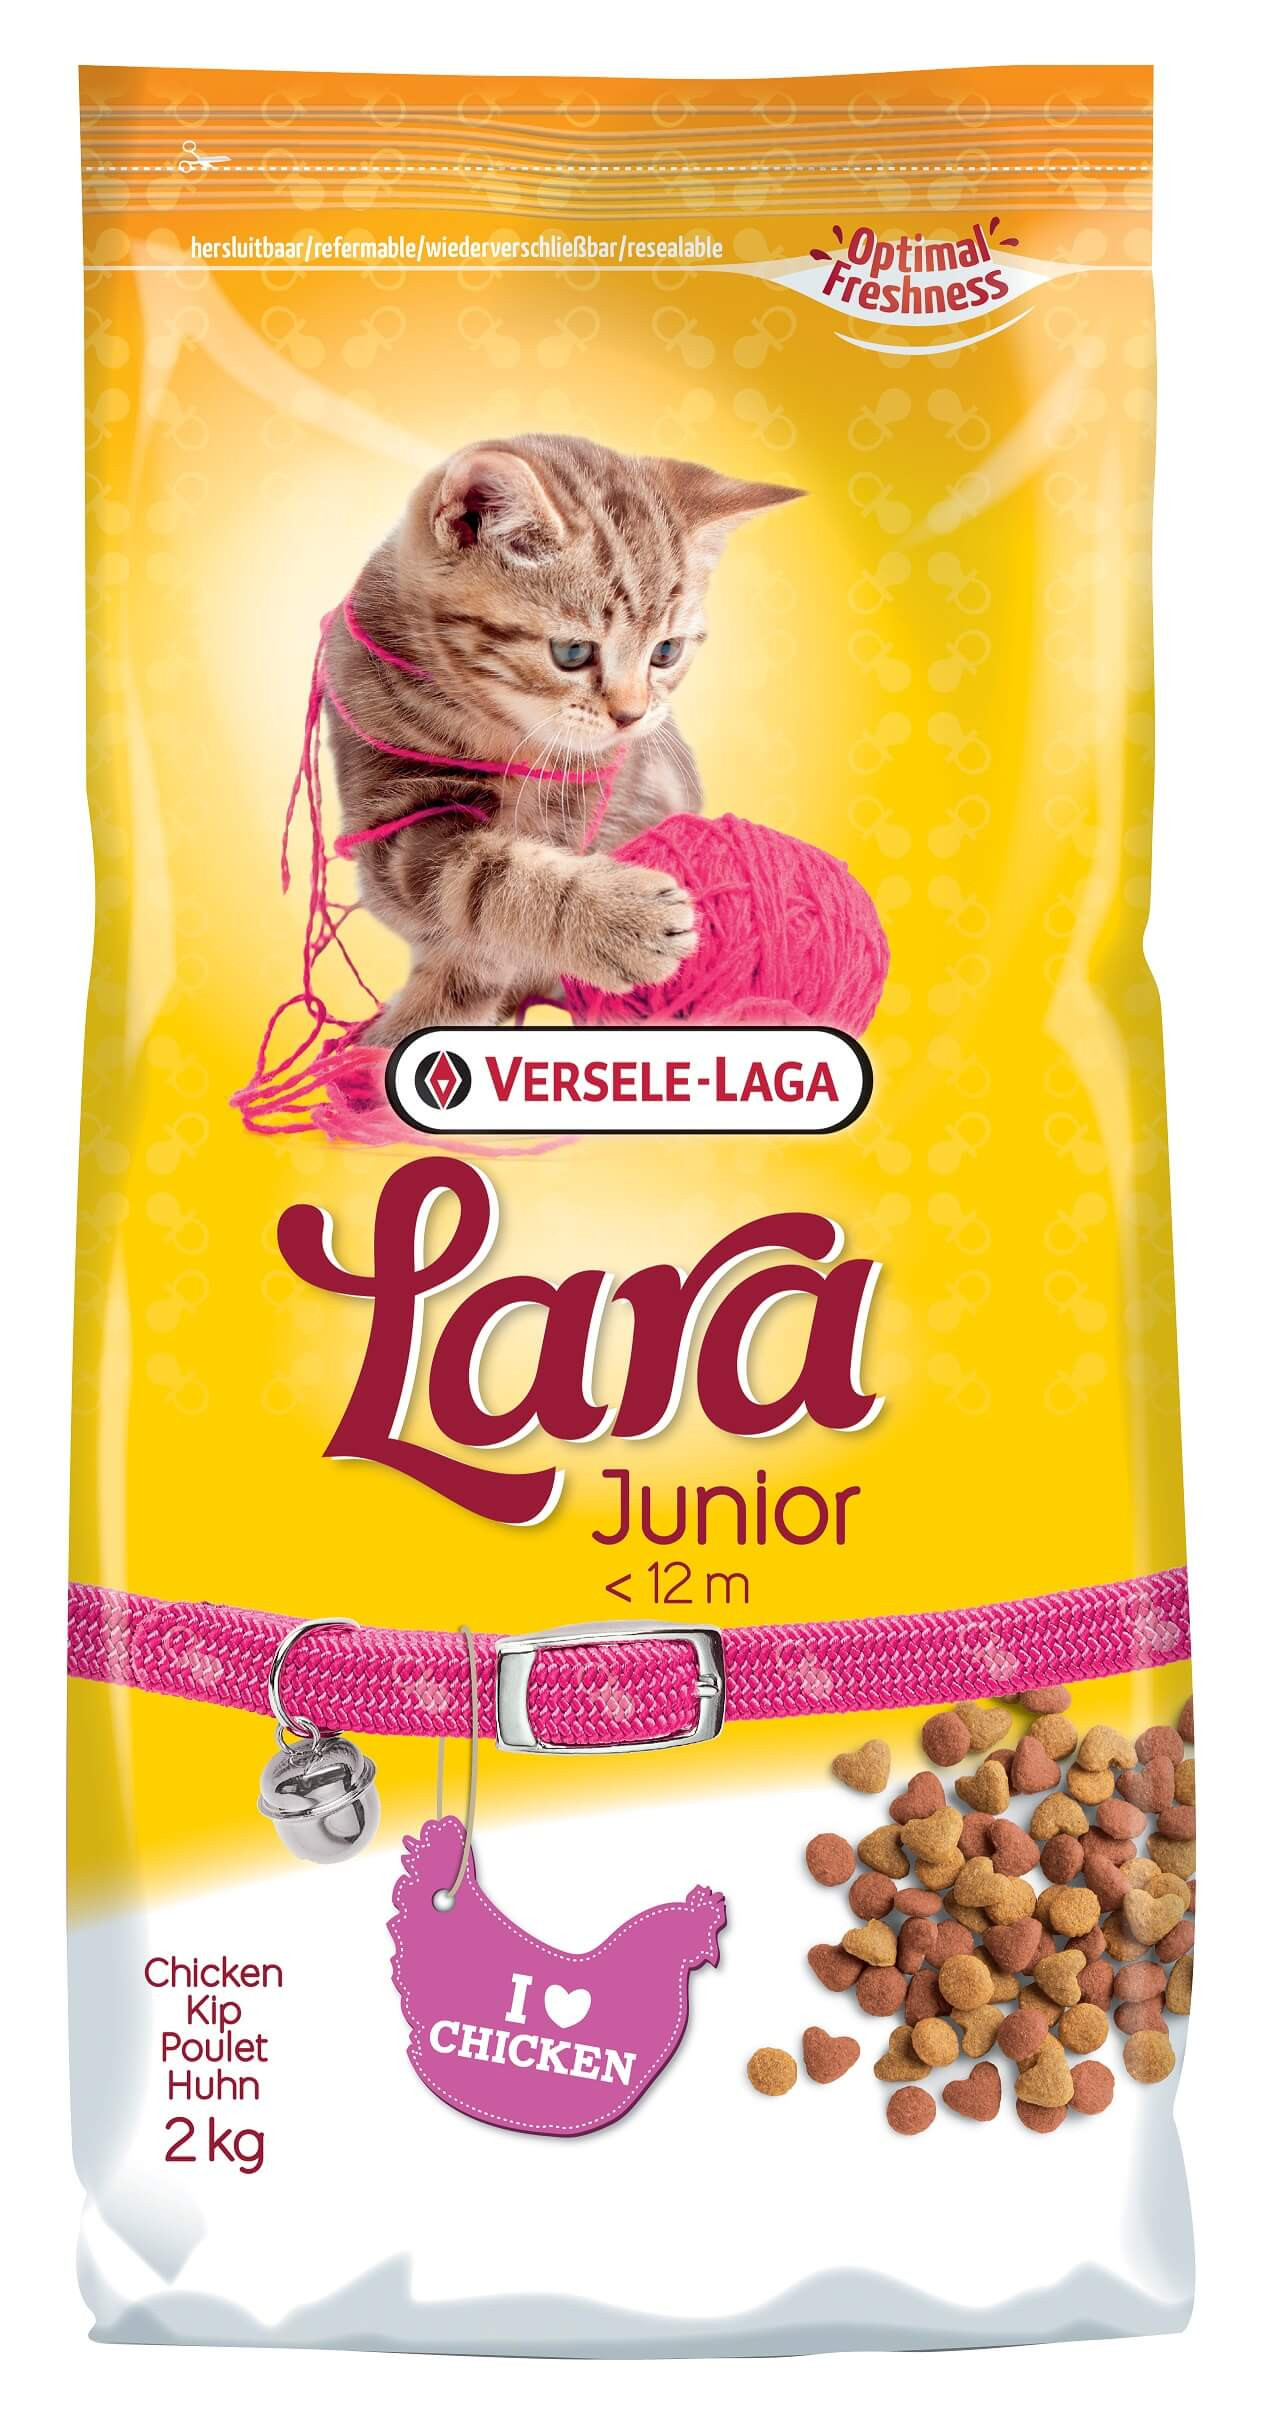 Versele-Laga Lara Junior Poulet pour chat